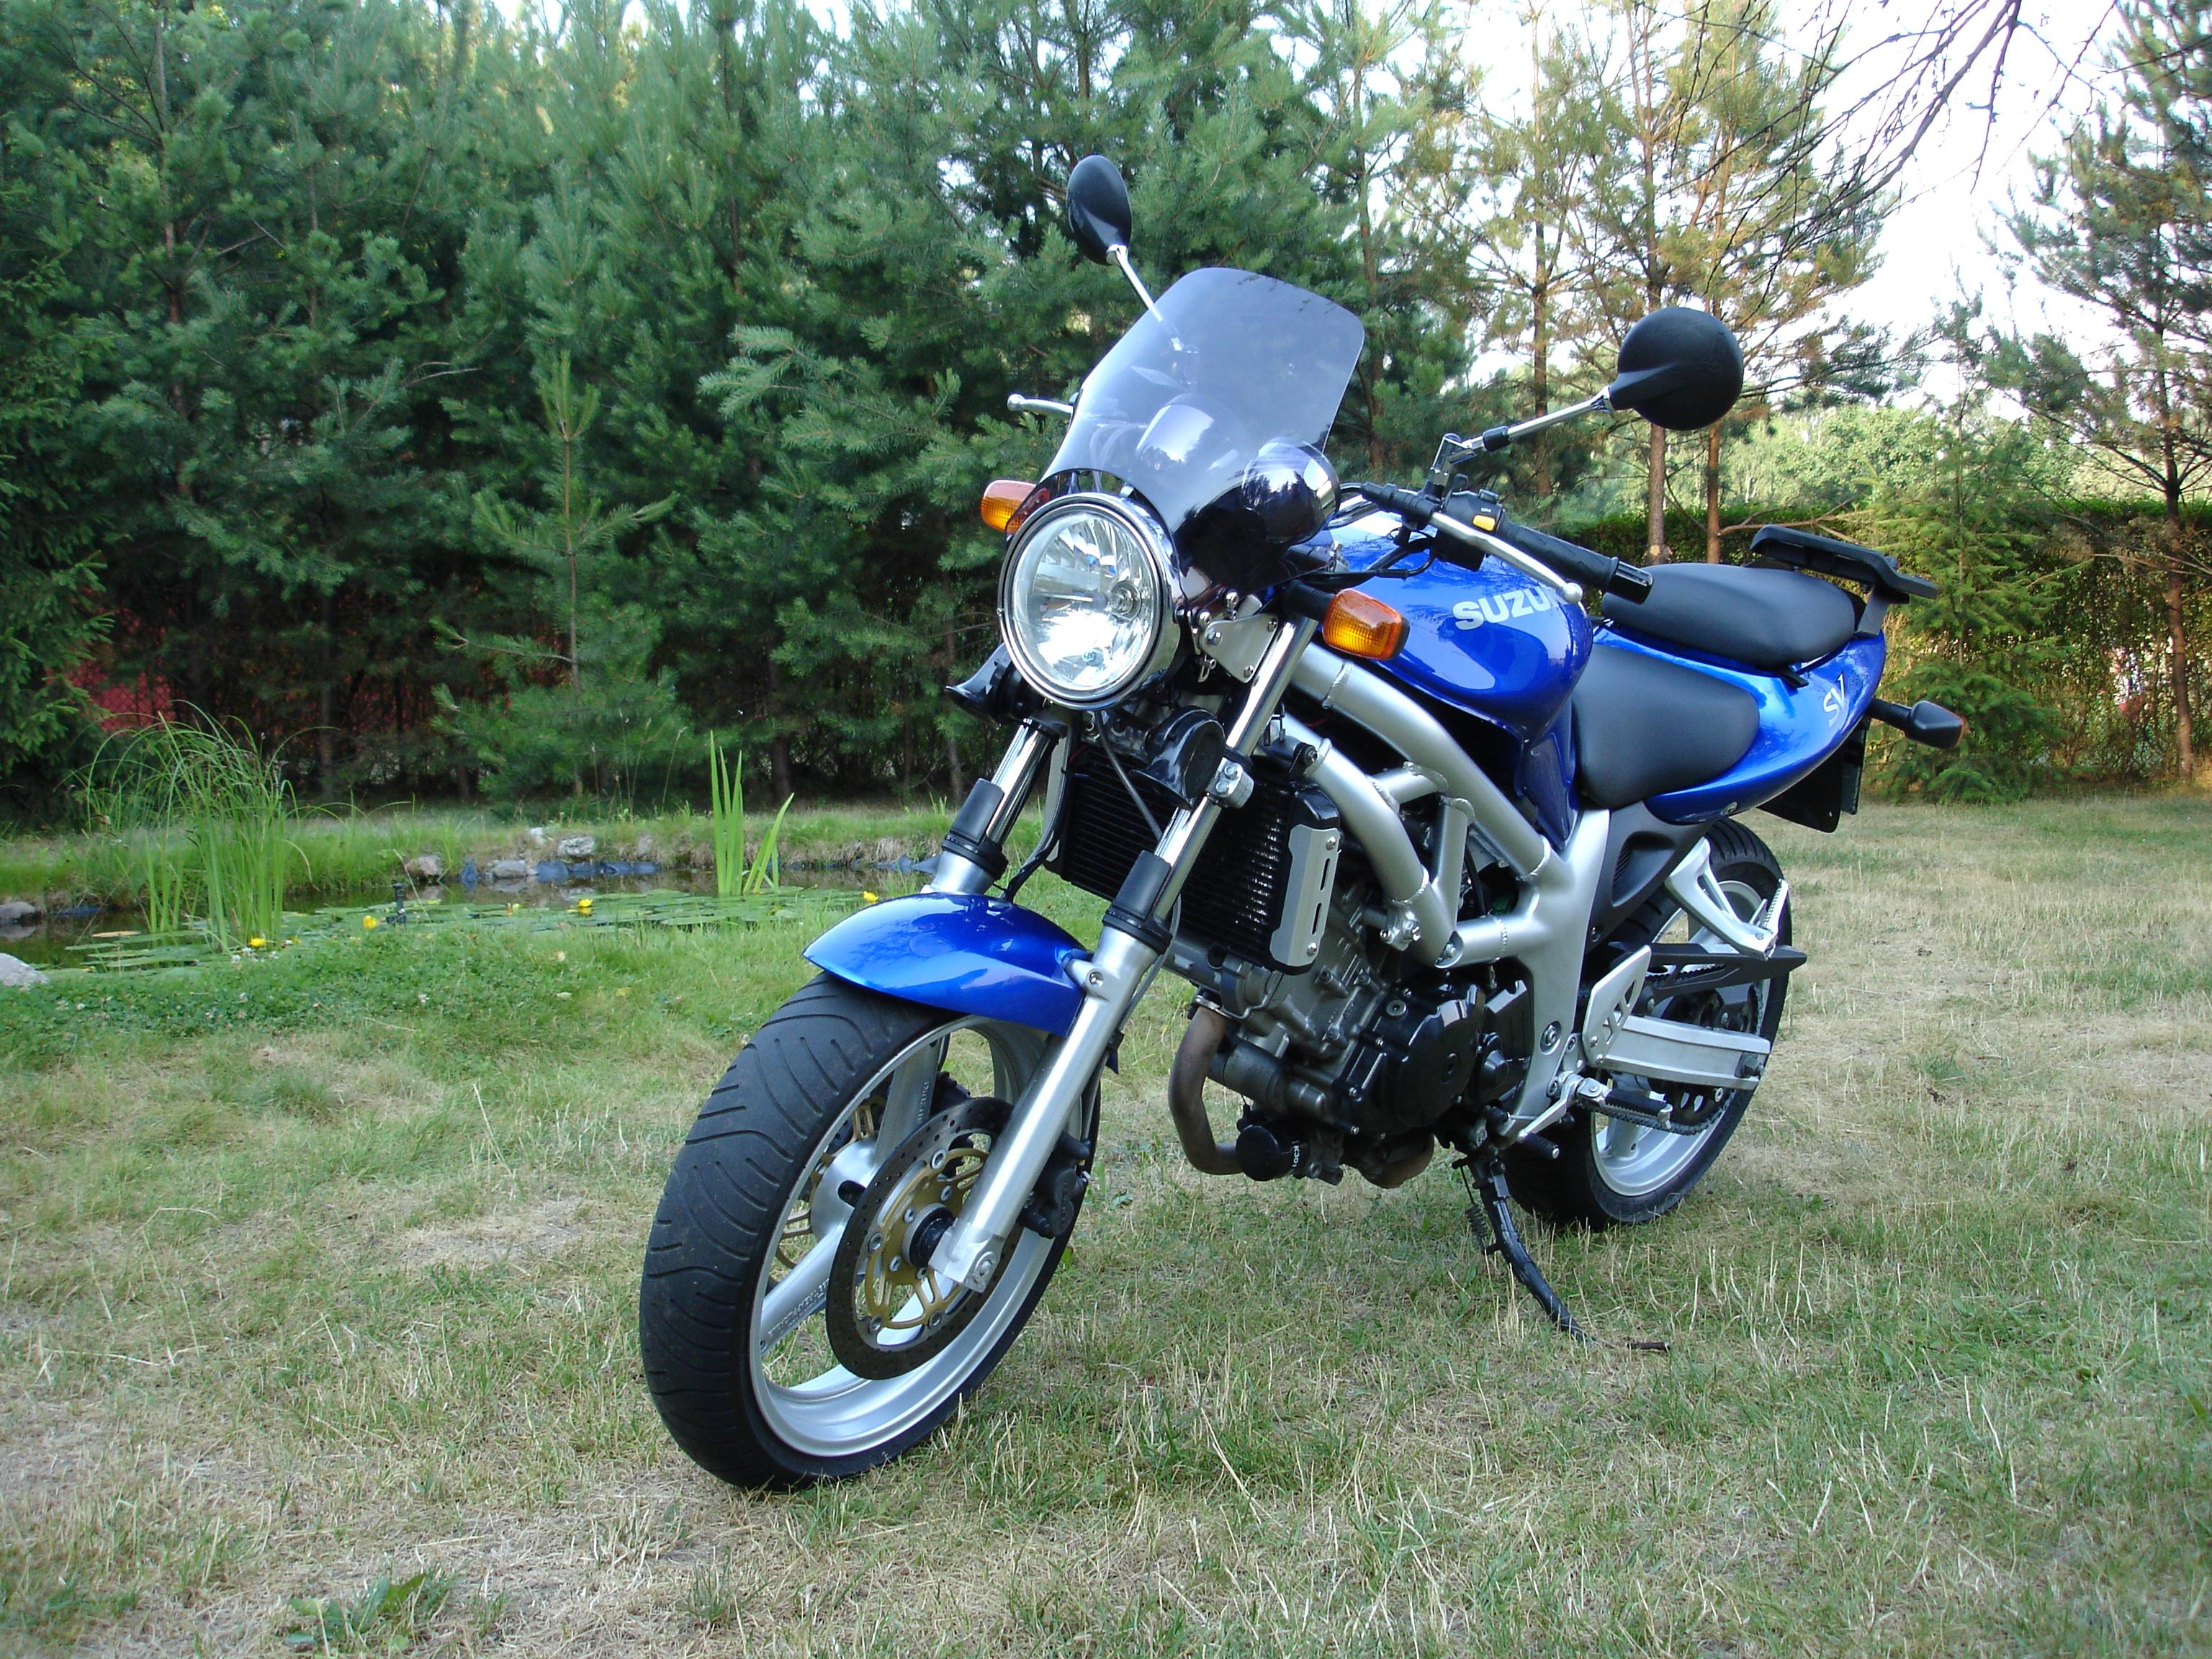 Suzuki sv 650 k8 akrapovic Exhaust cz1 - YouTube